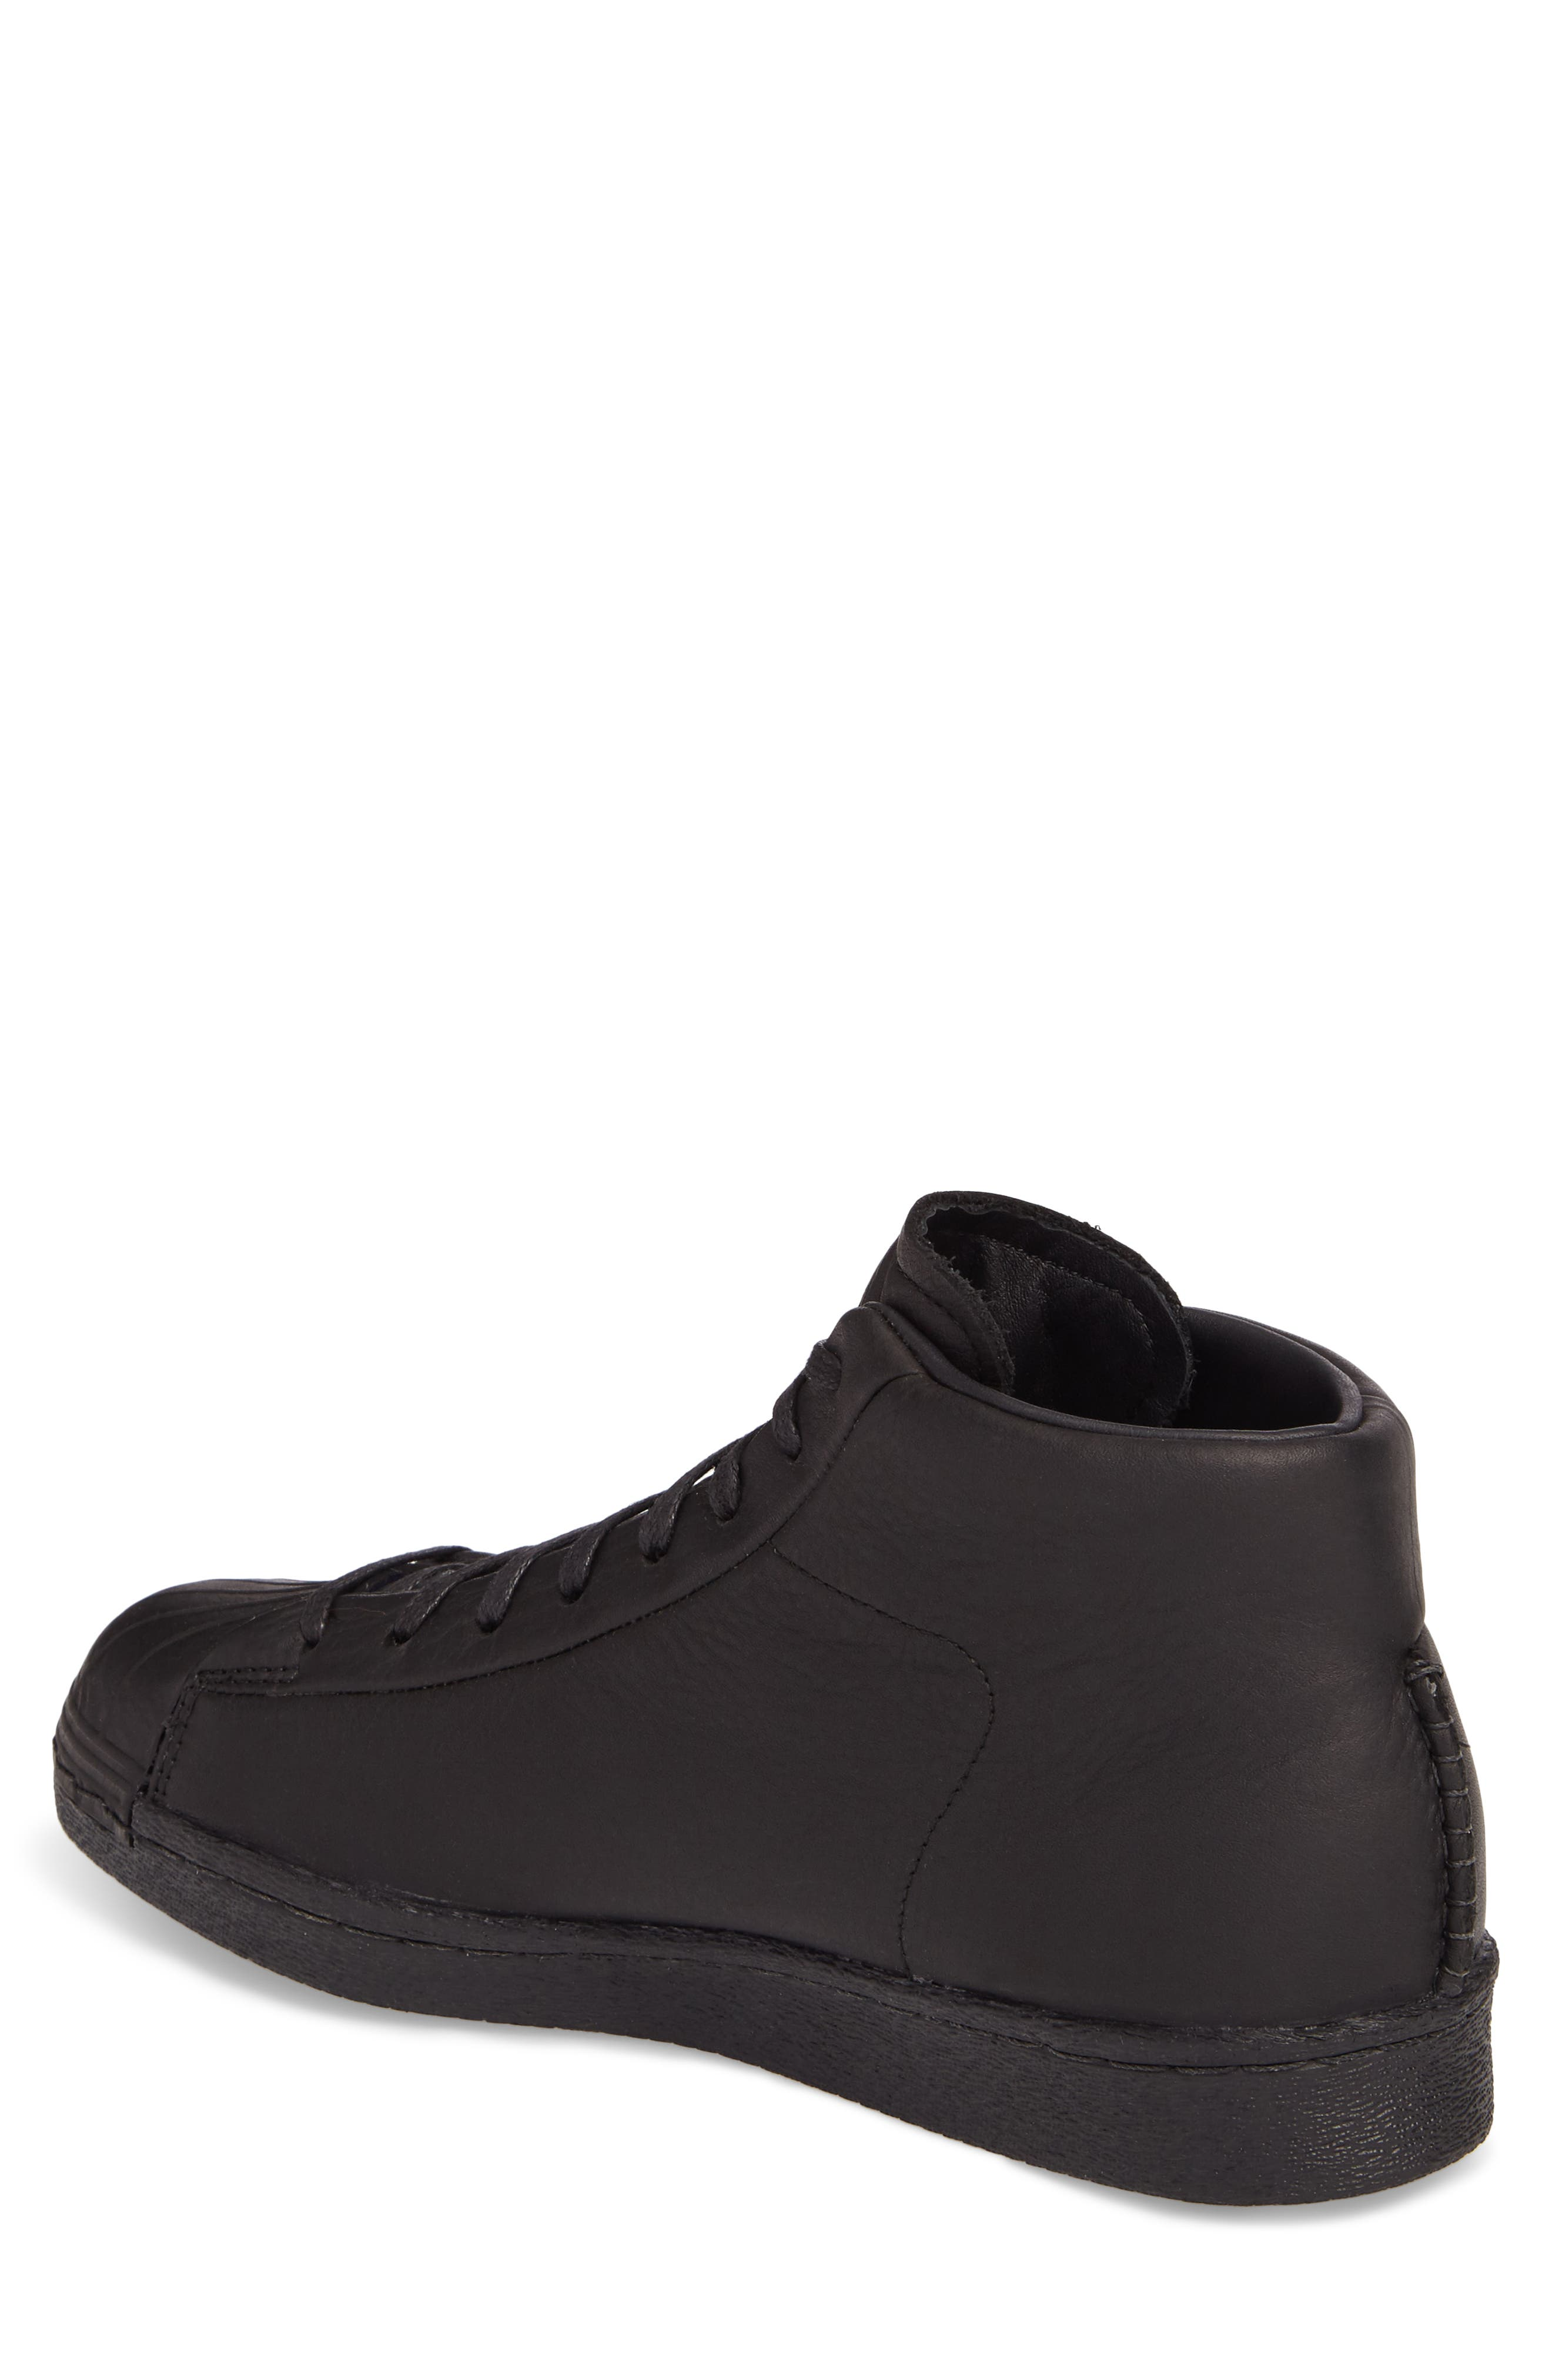 High-Top Sneaker,                             Alternate thumbnail 2, color,                             001